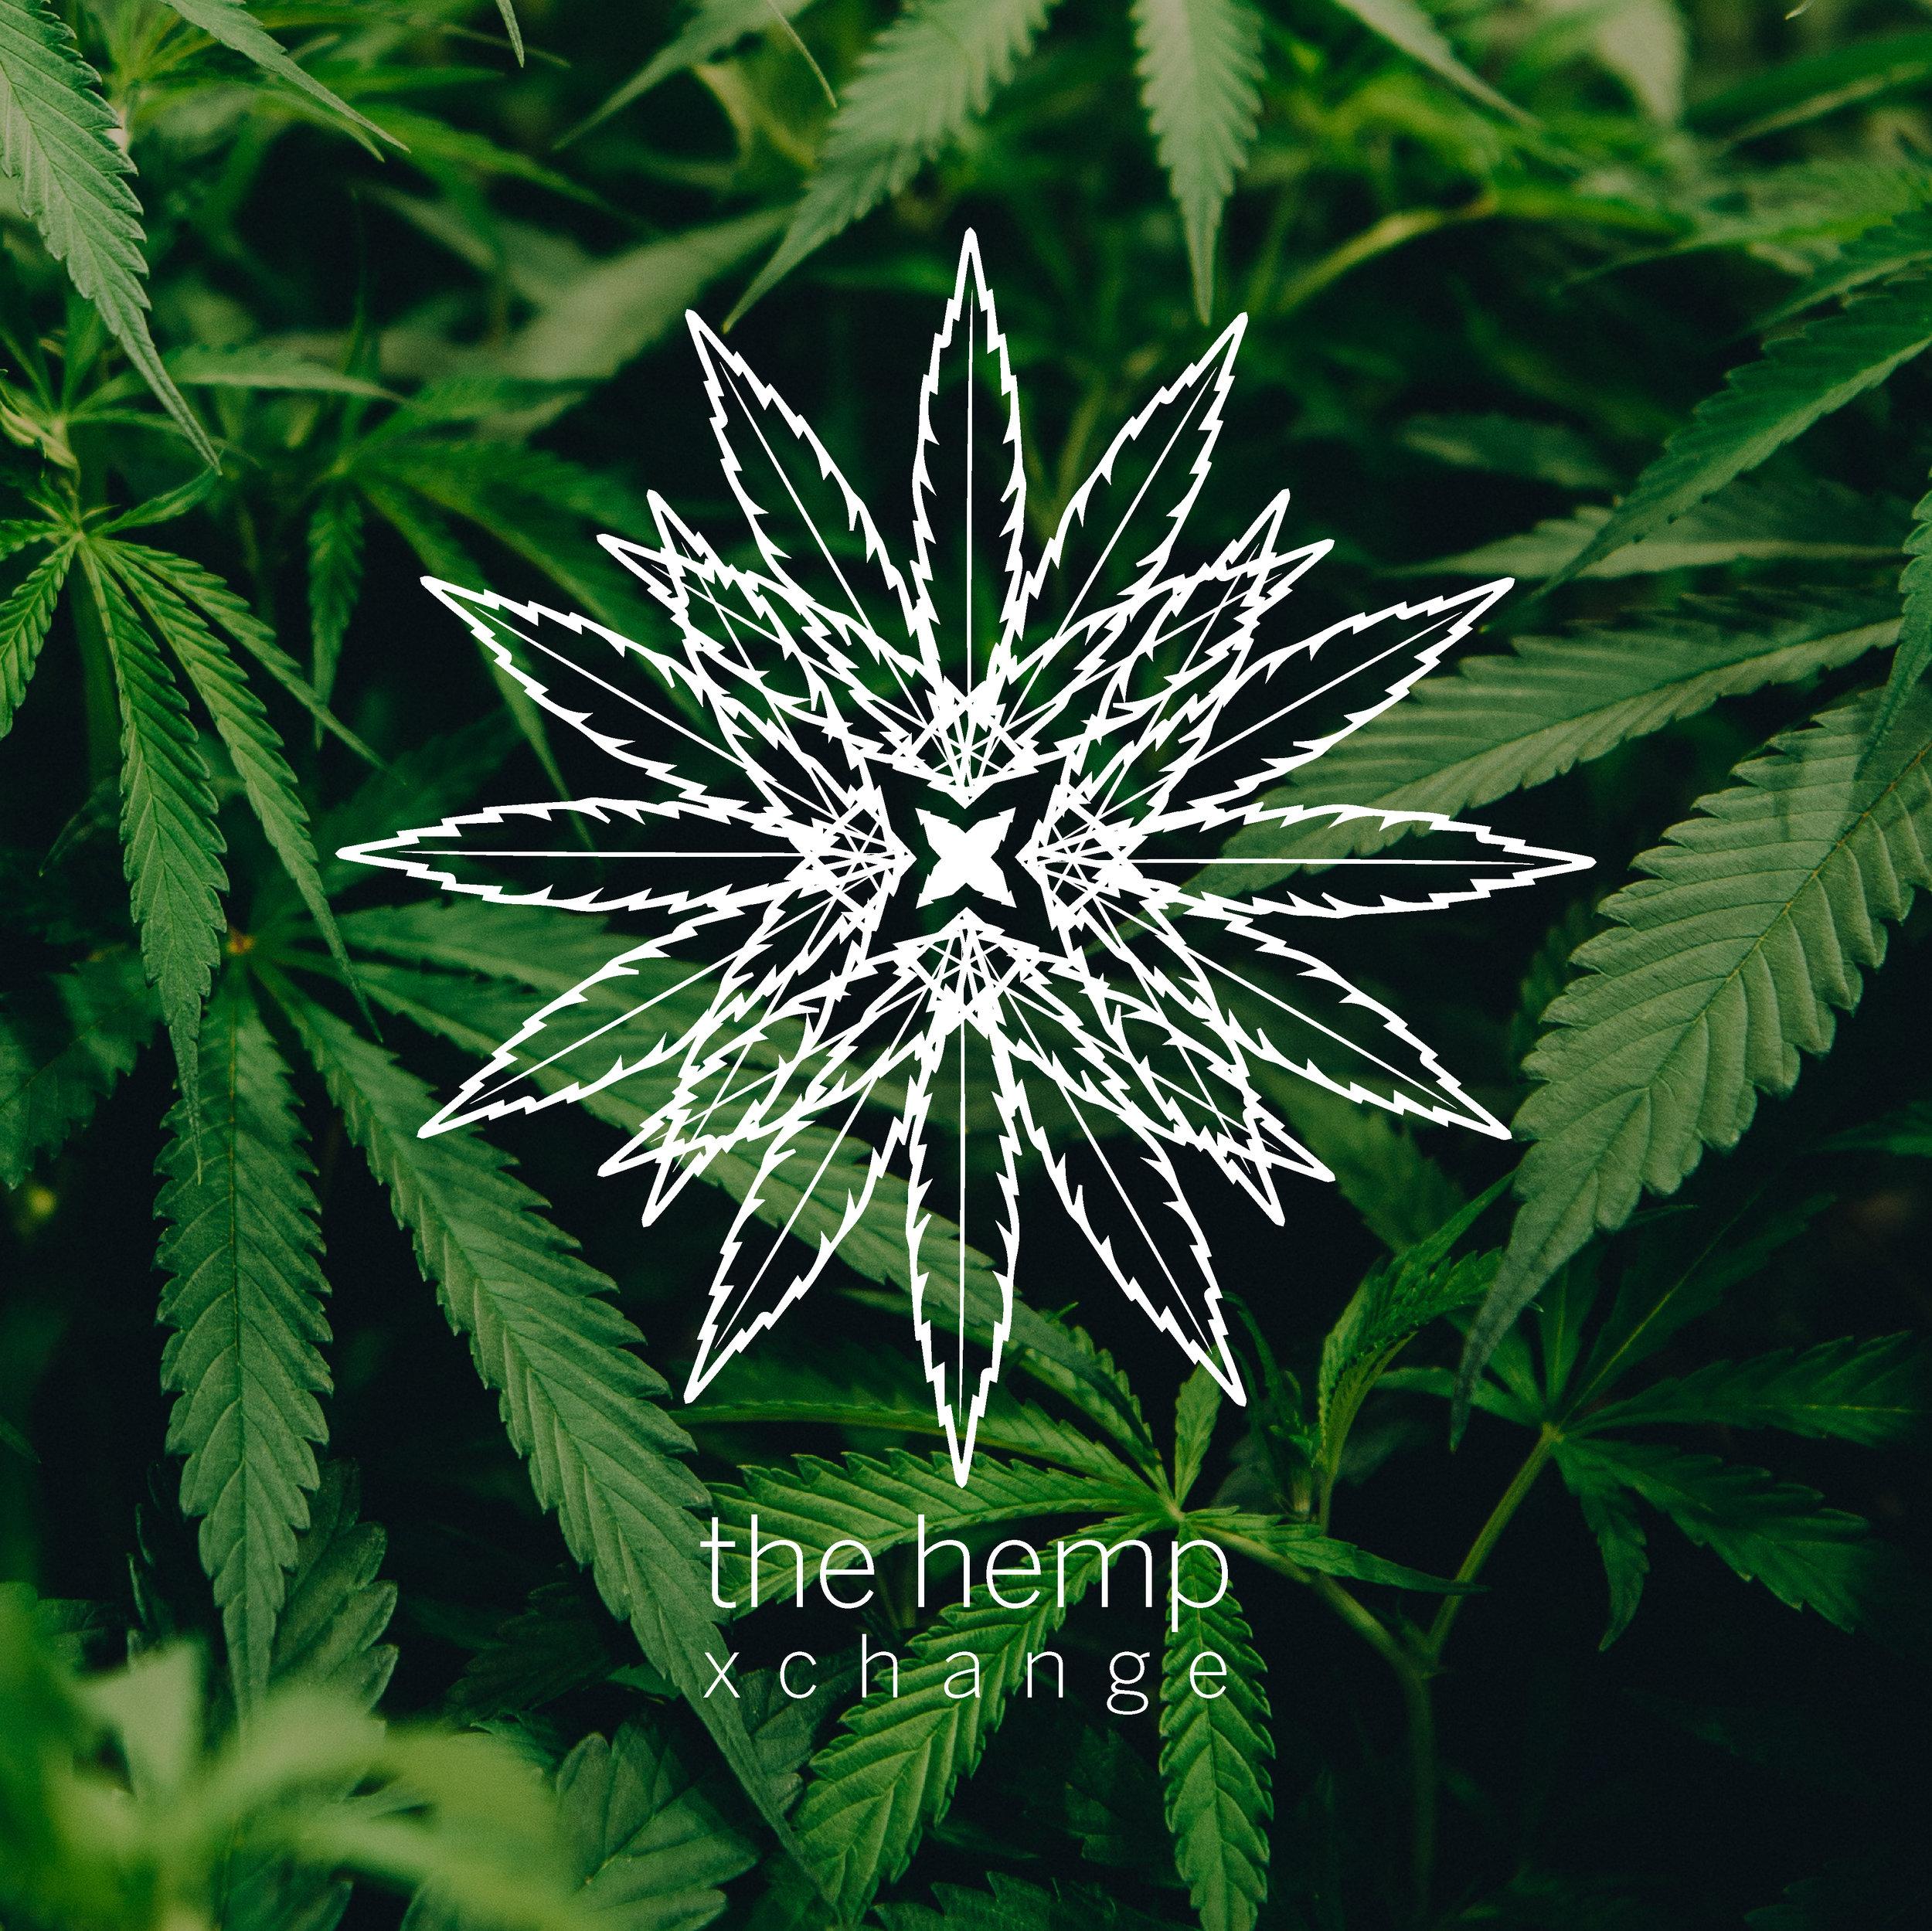 The Hemp Xchange Logo Design